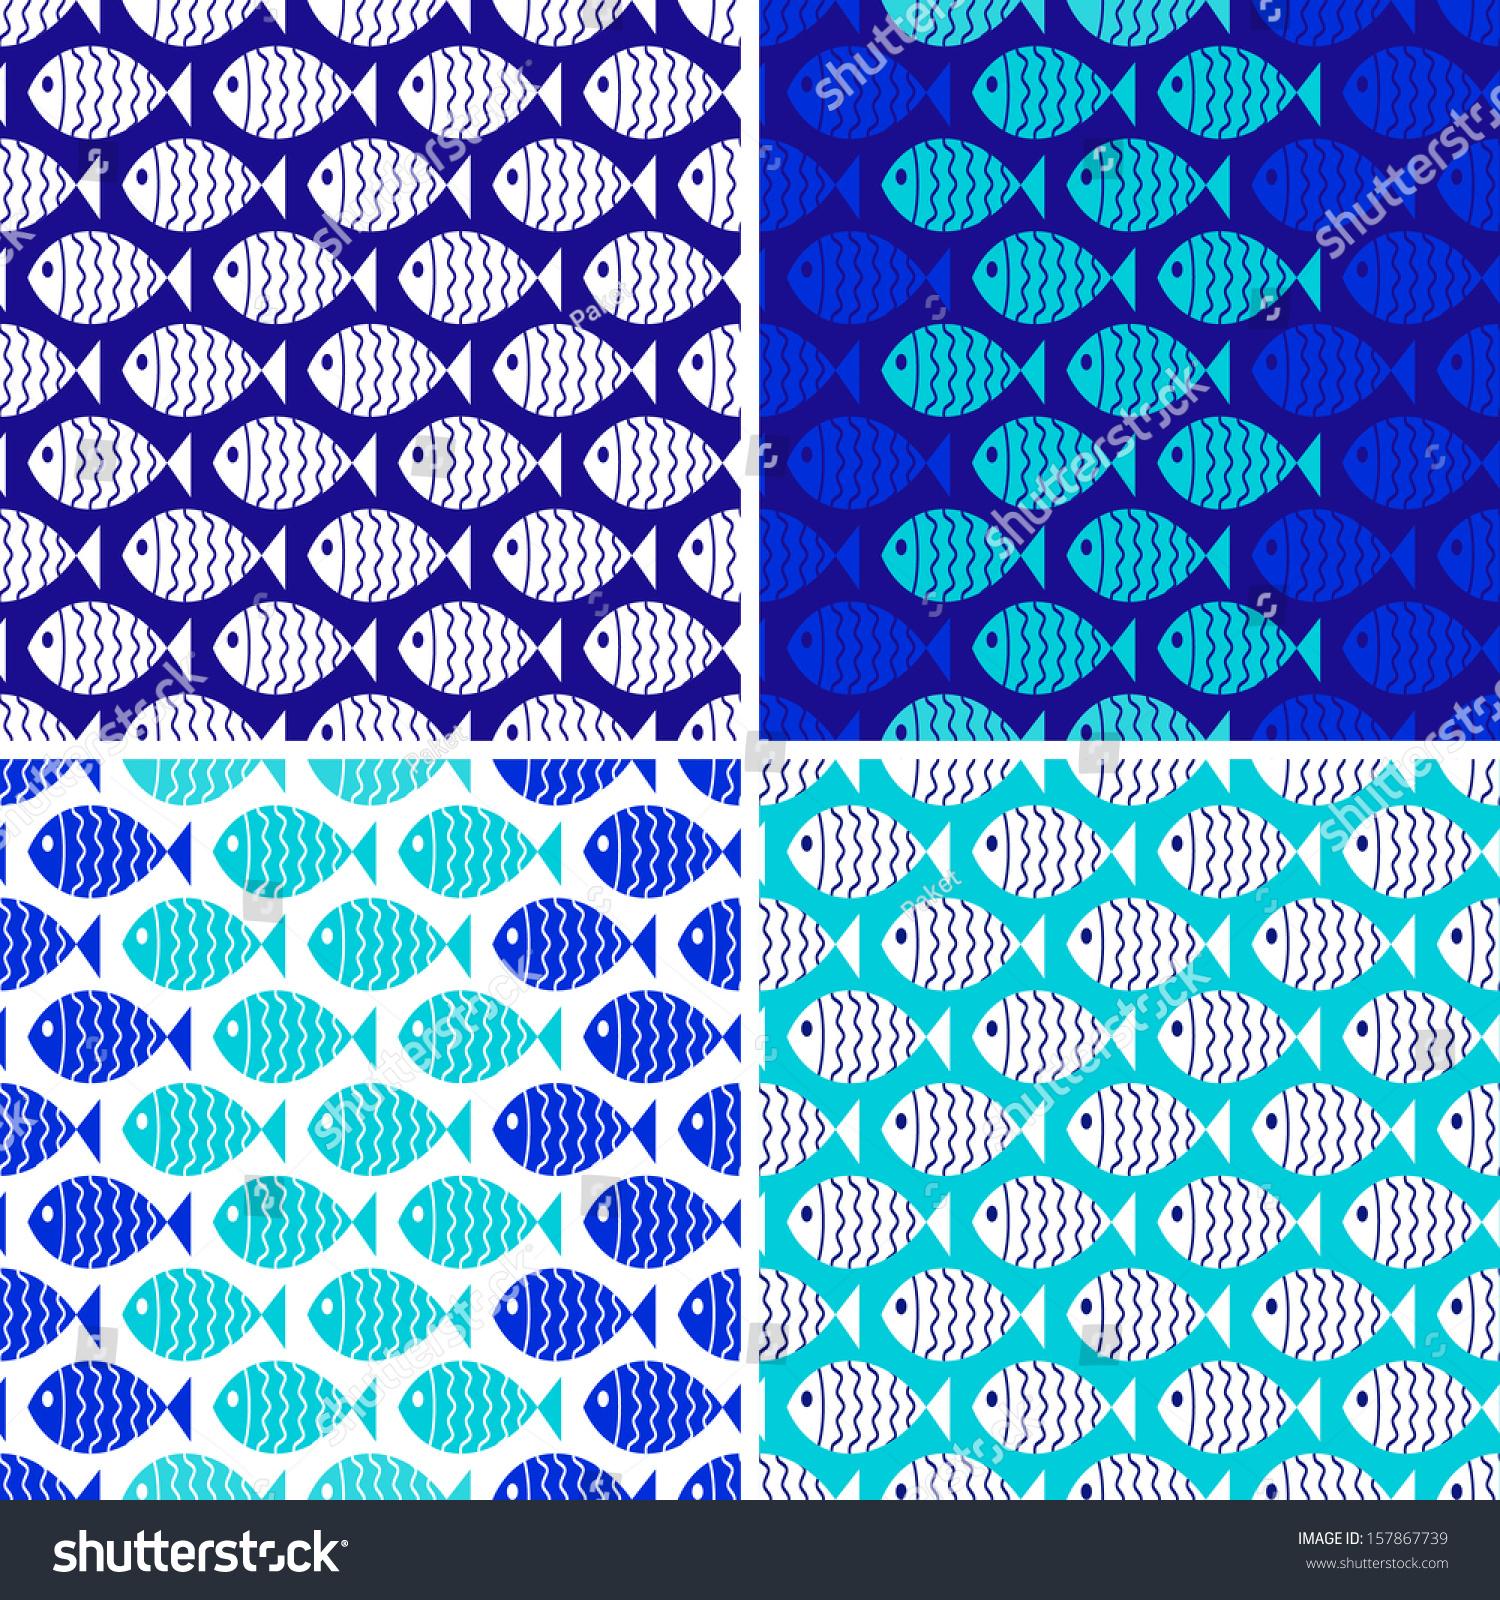 Seamless Nautical Themed Patterns Set Fish Stock Vector